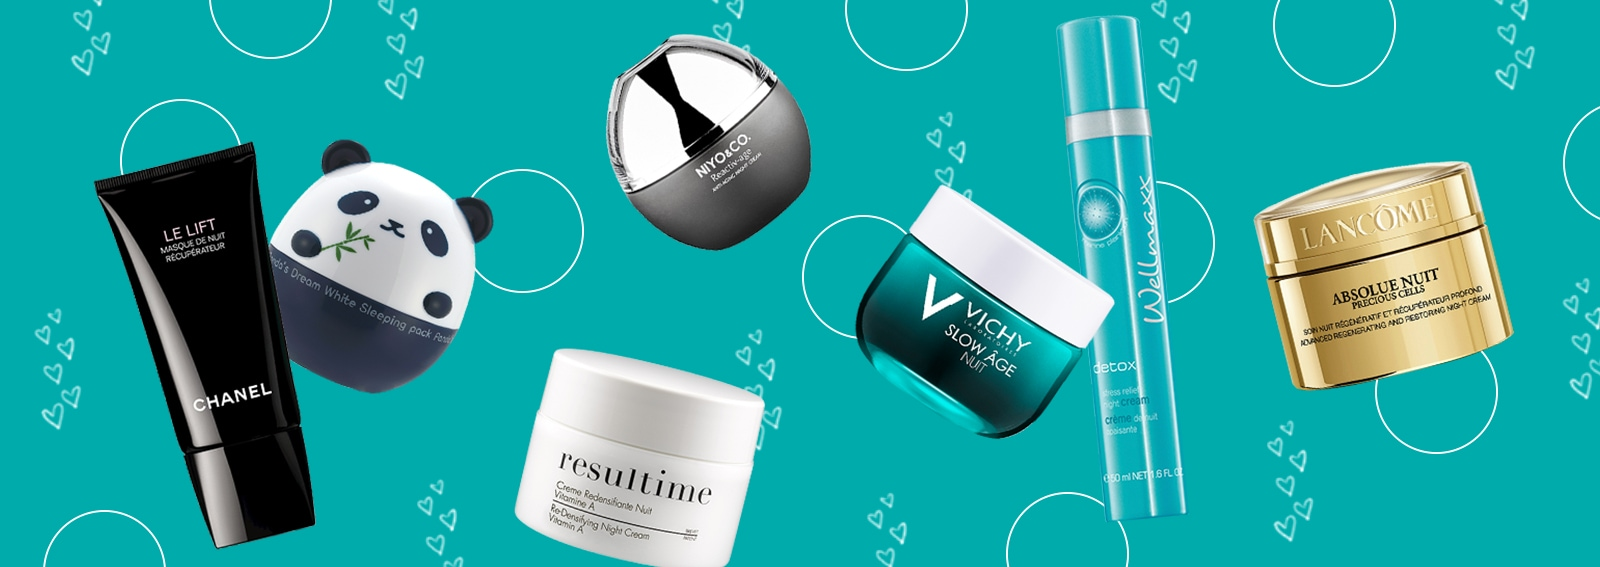 10 modi per rigenerare la vostra pelle mentre dormite-desktop